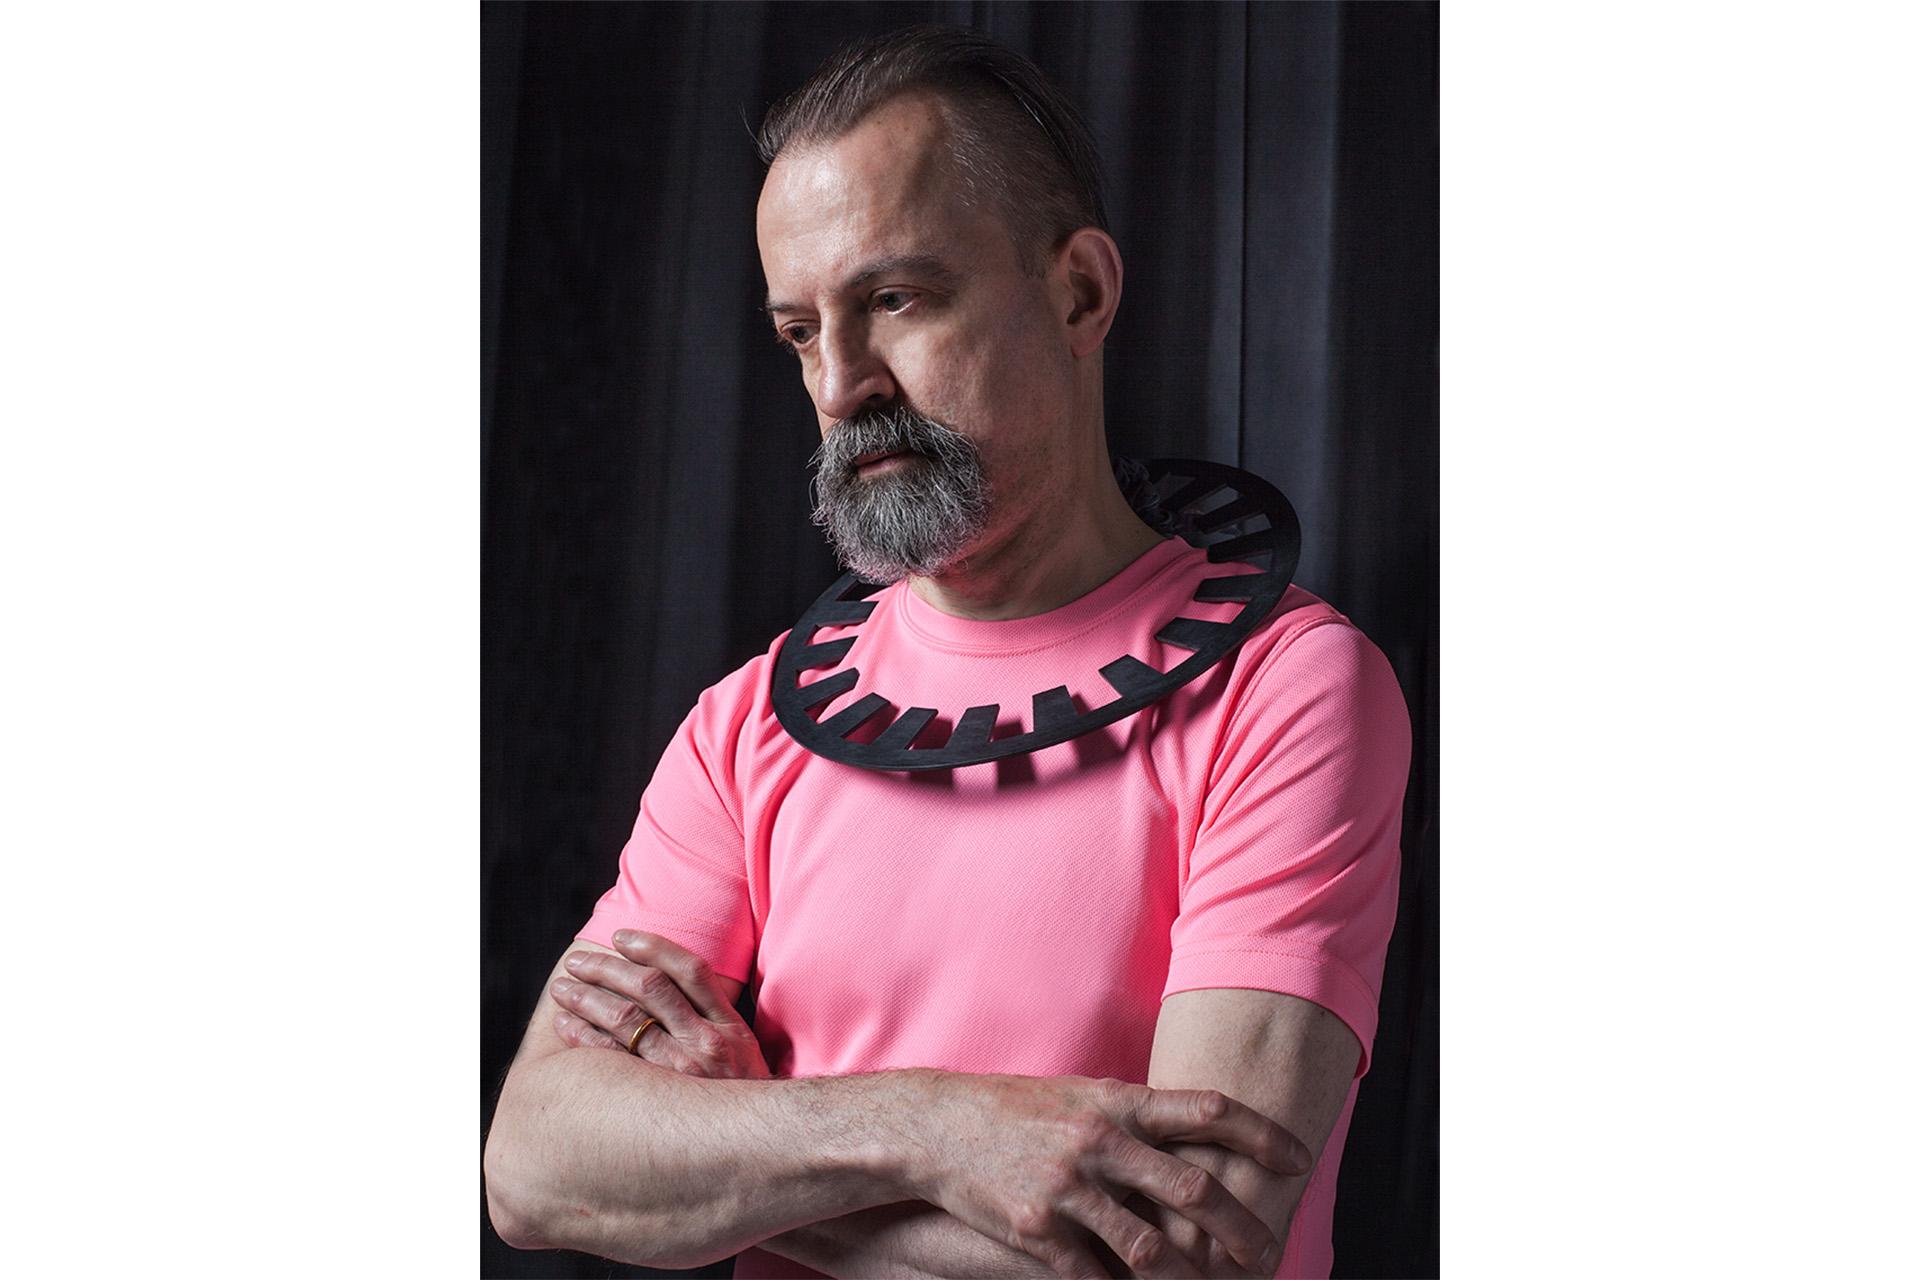 website gt - Paul woth a round black neckclace